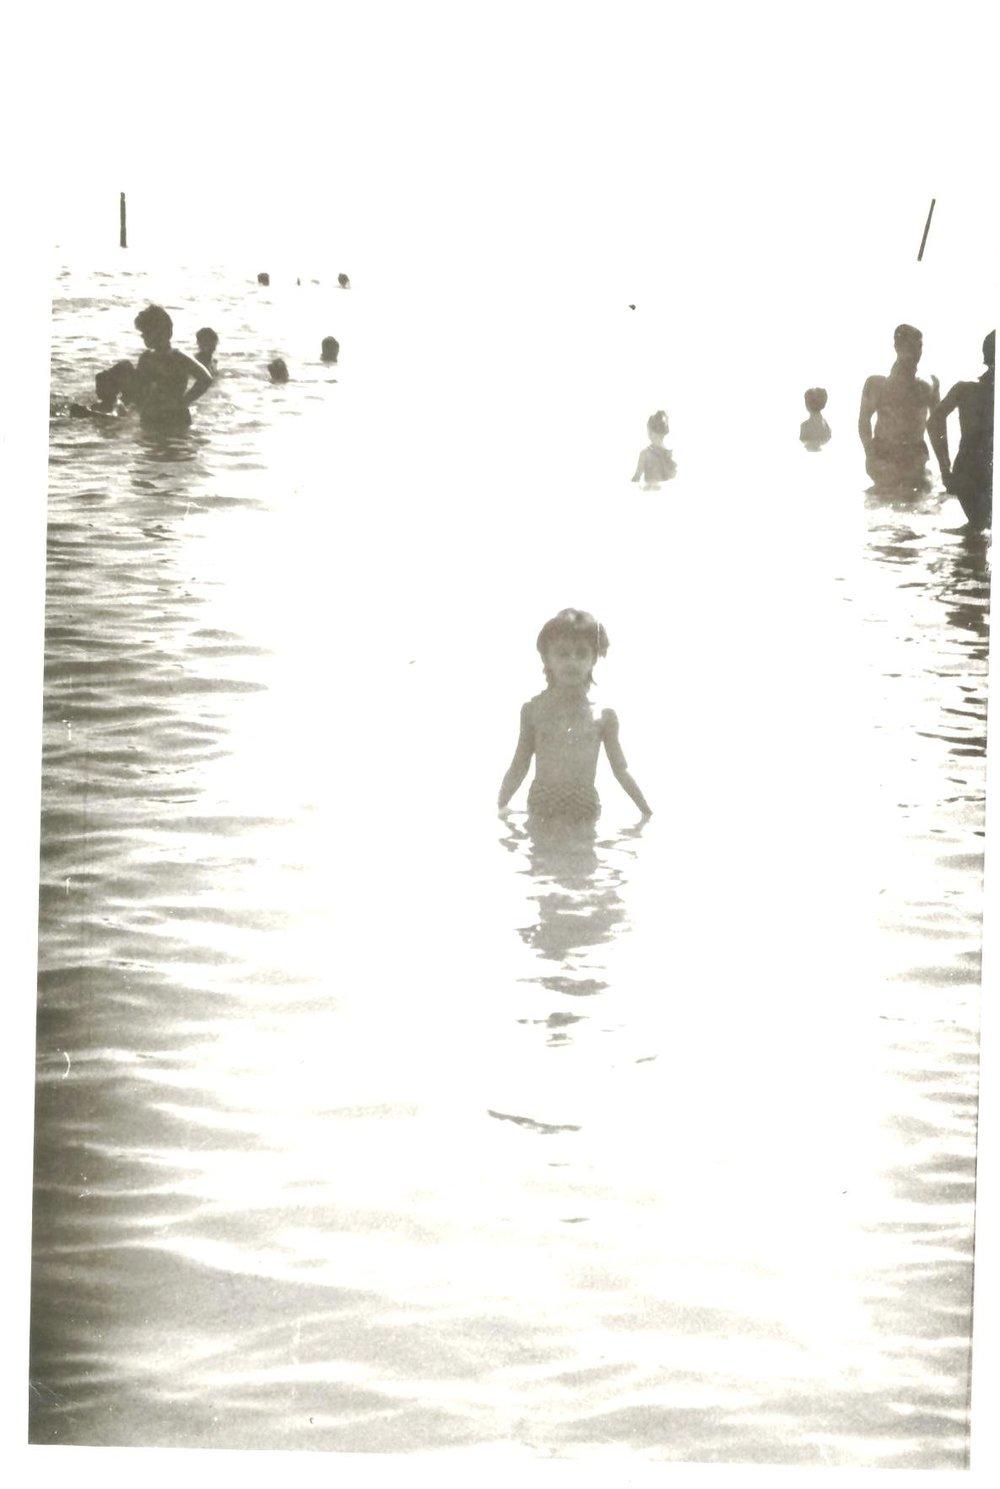 Swimming in the Caspian Sea